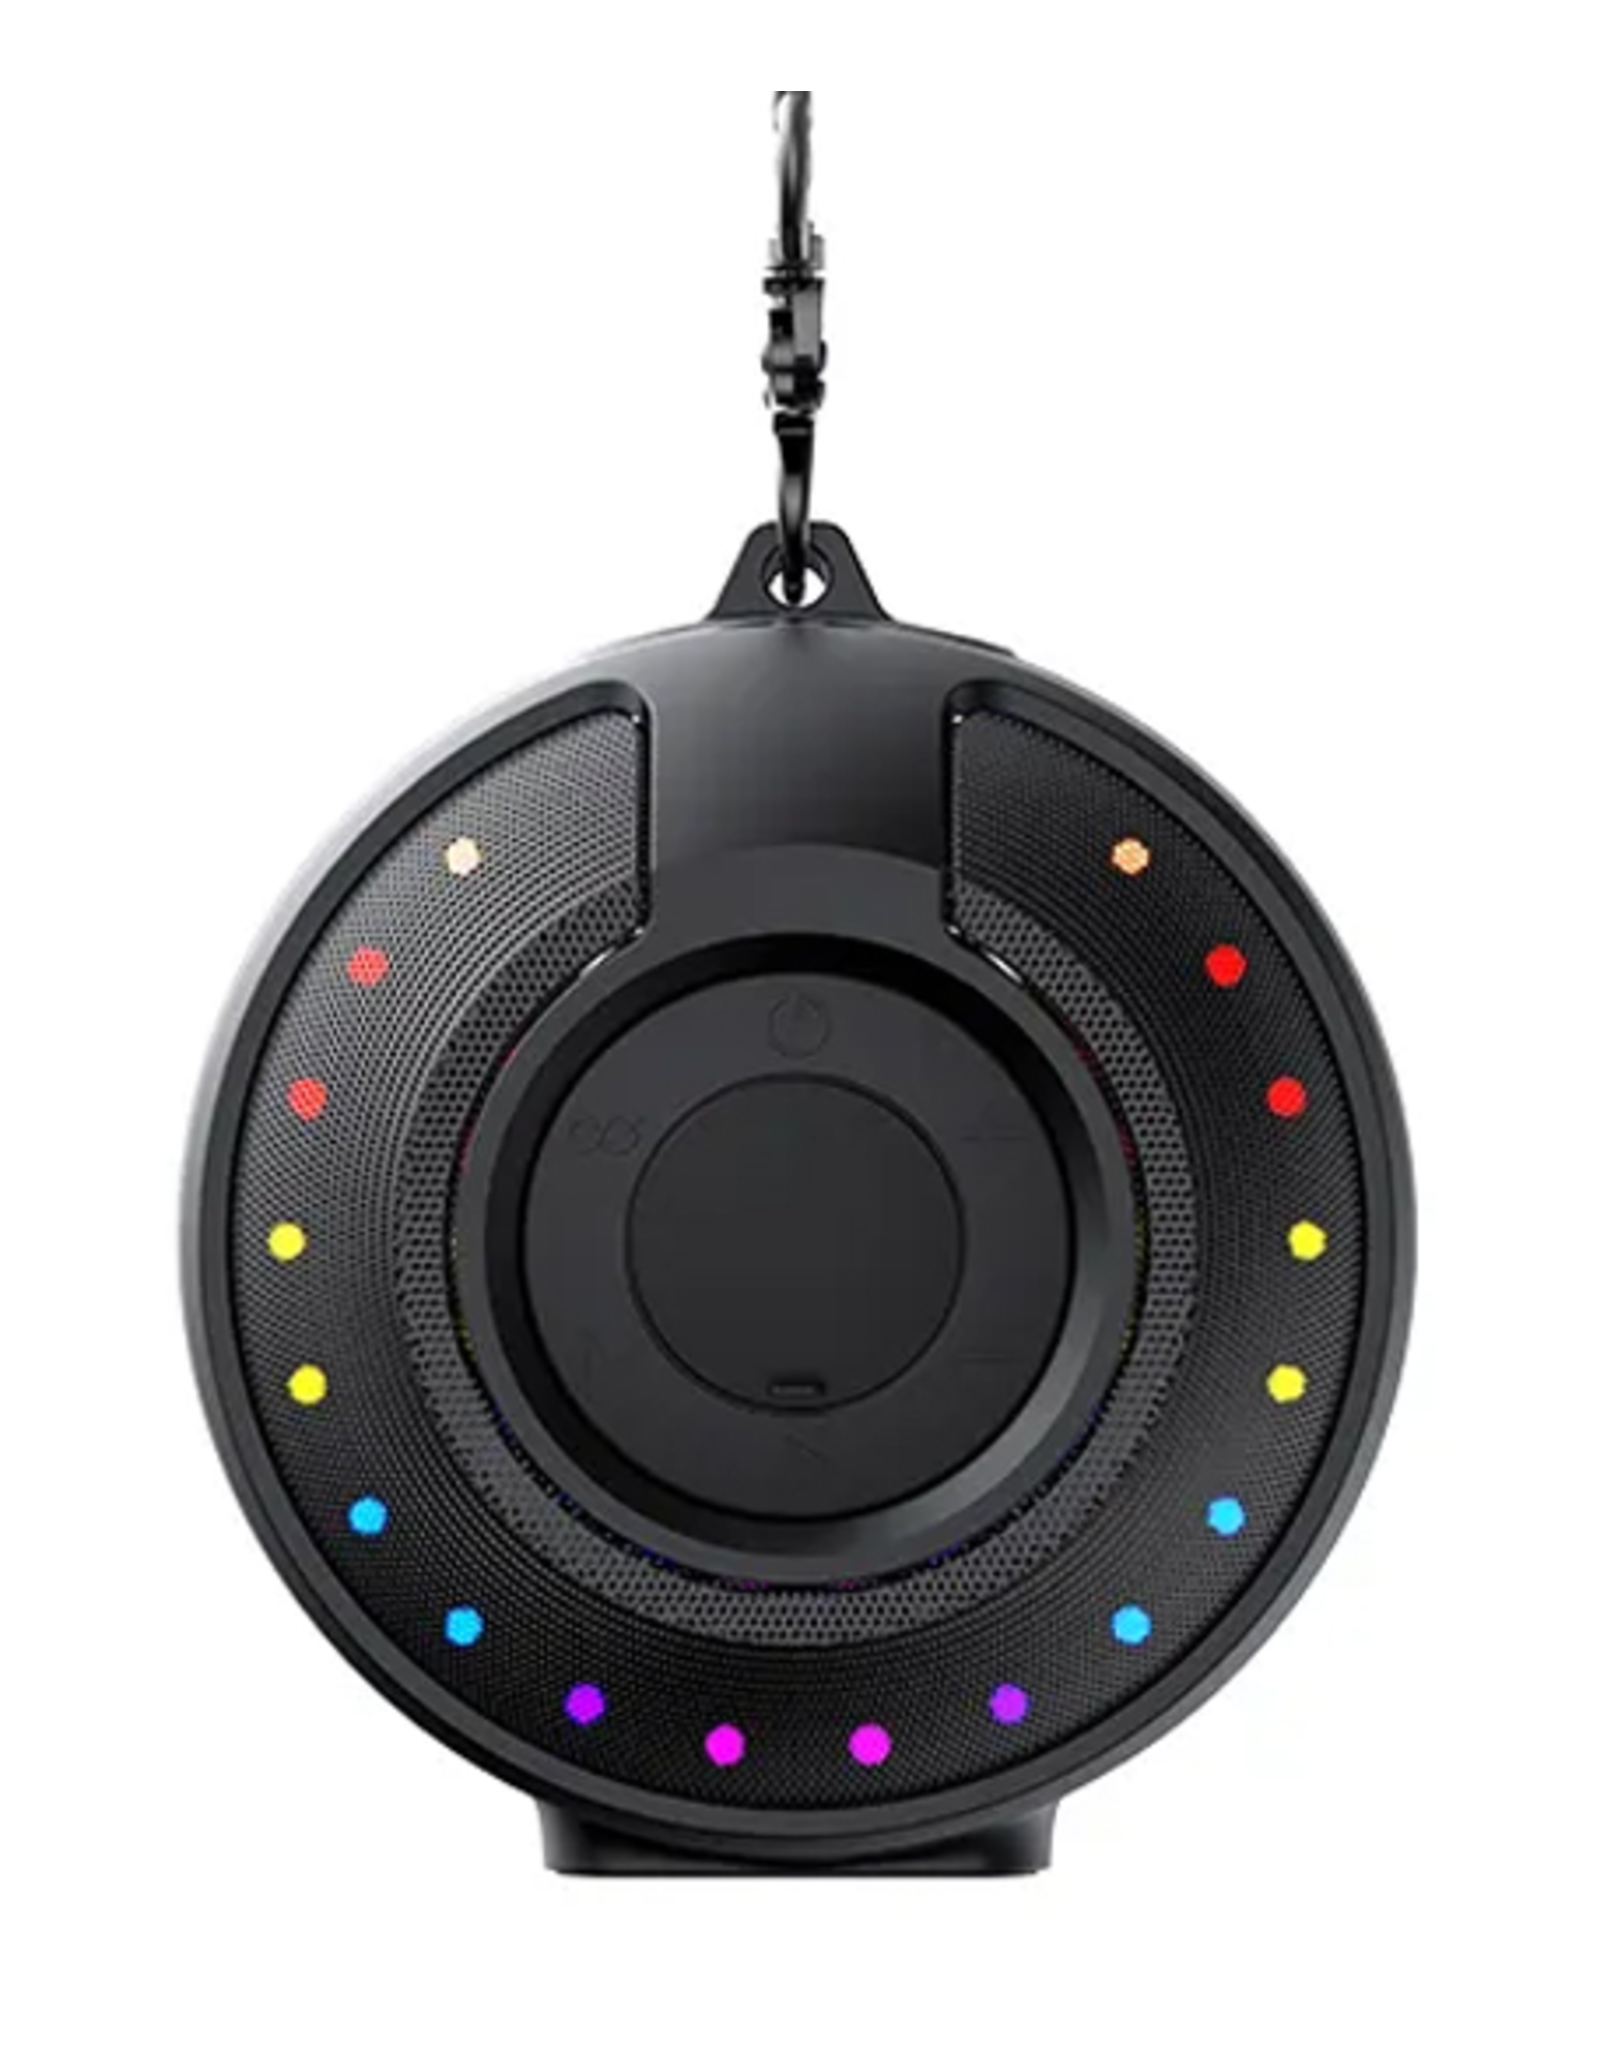 Havit Havit SK841BT Portable outdoor Wireless Bluetooth V5.0 charming RGB LED Lighting, High power 8W waterproof fabric speaker